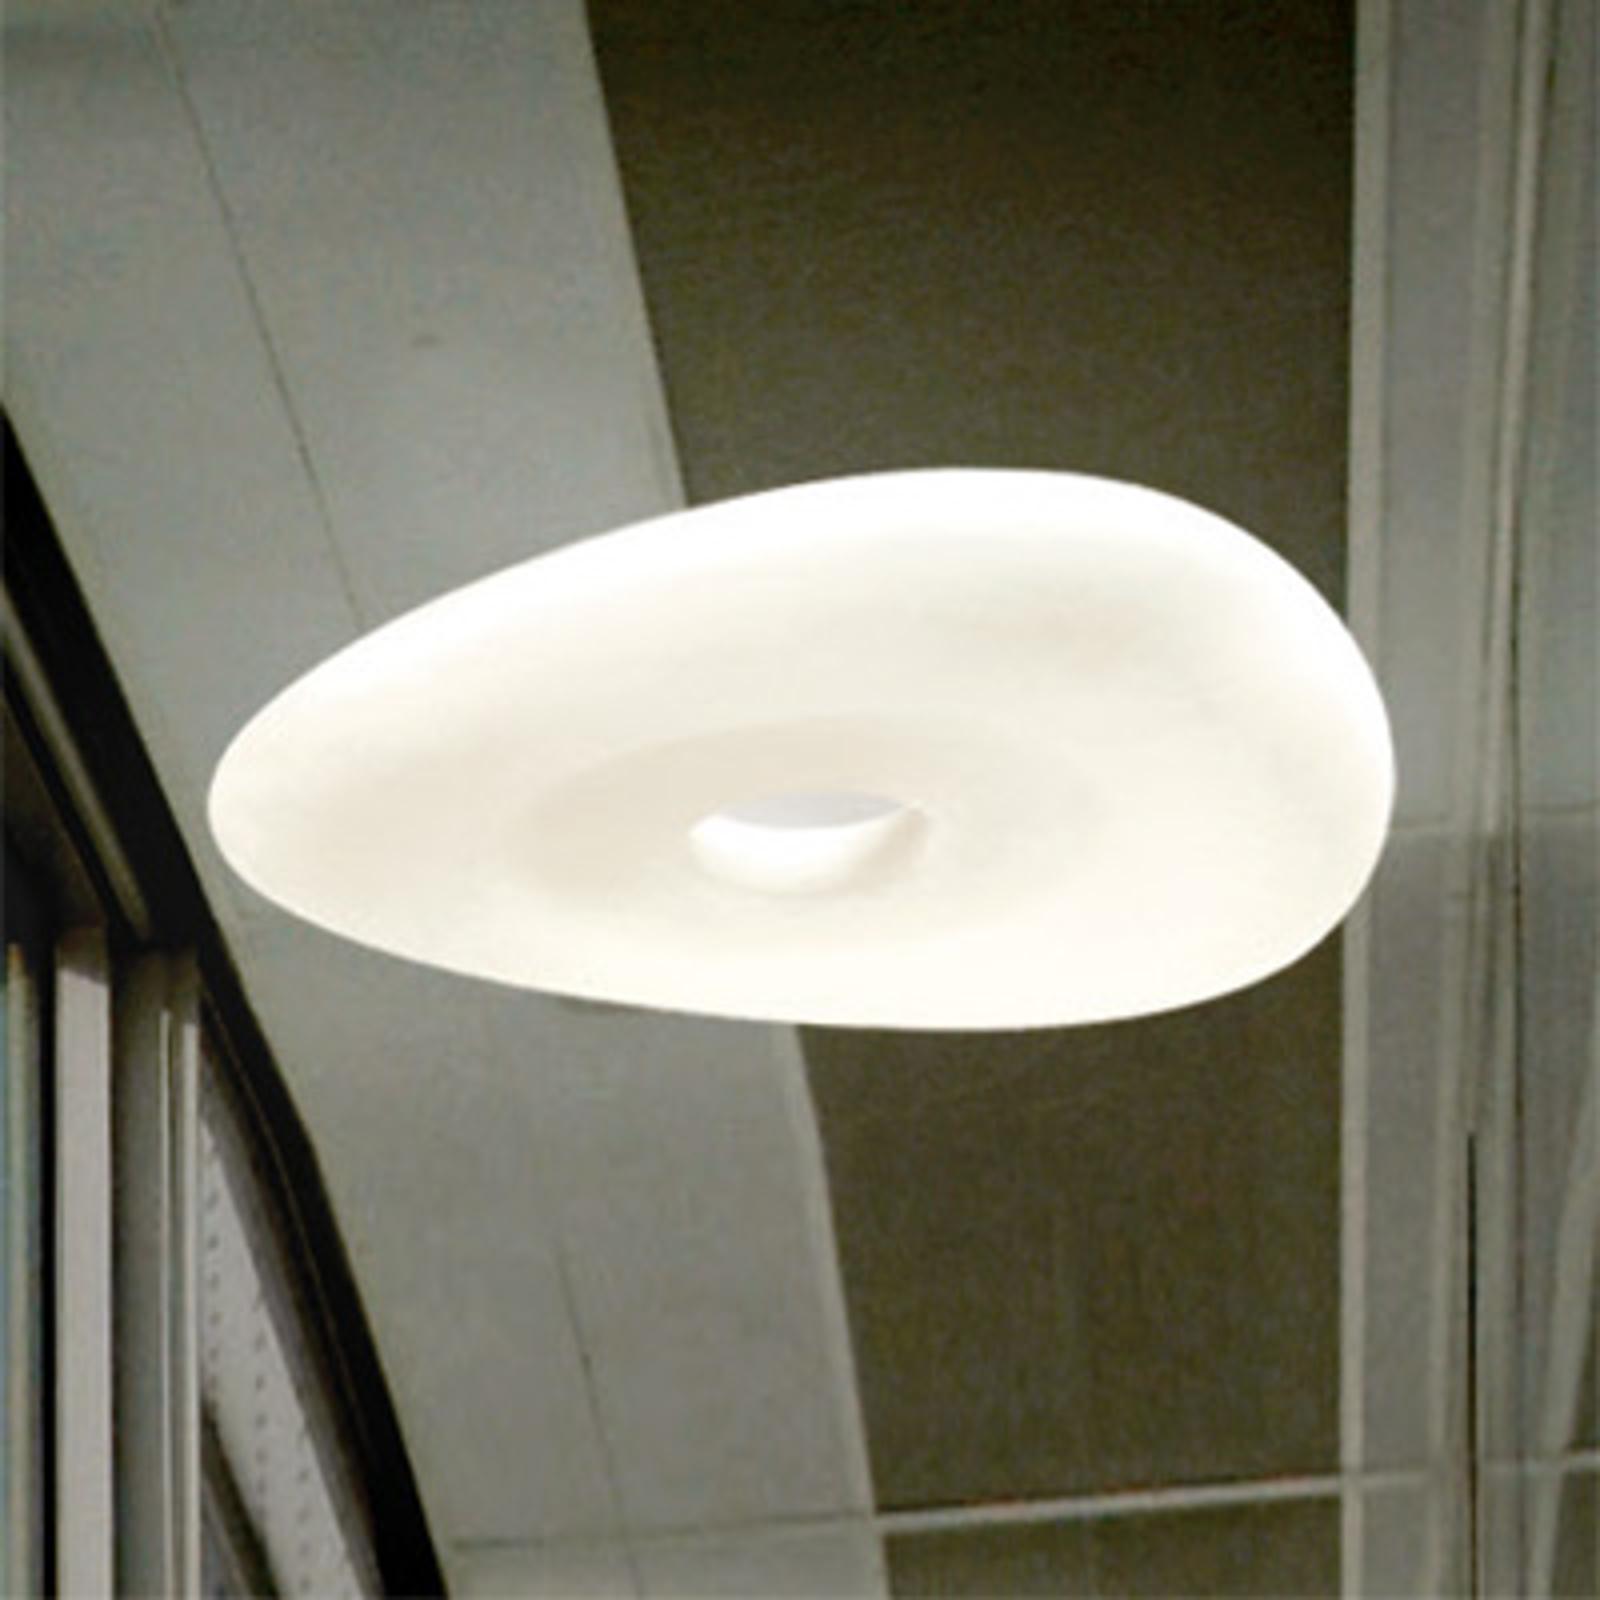 LED-taklampa Mr Magoo, 76 cm